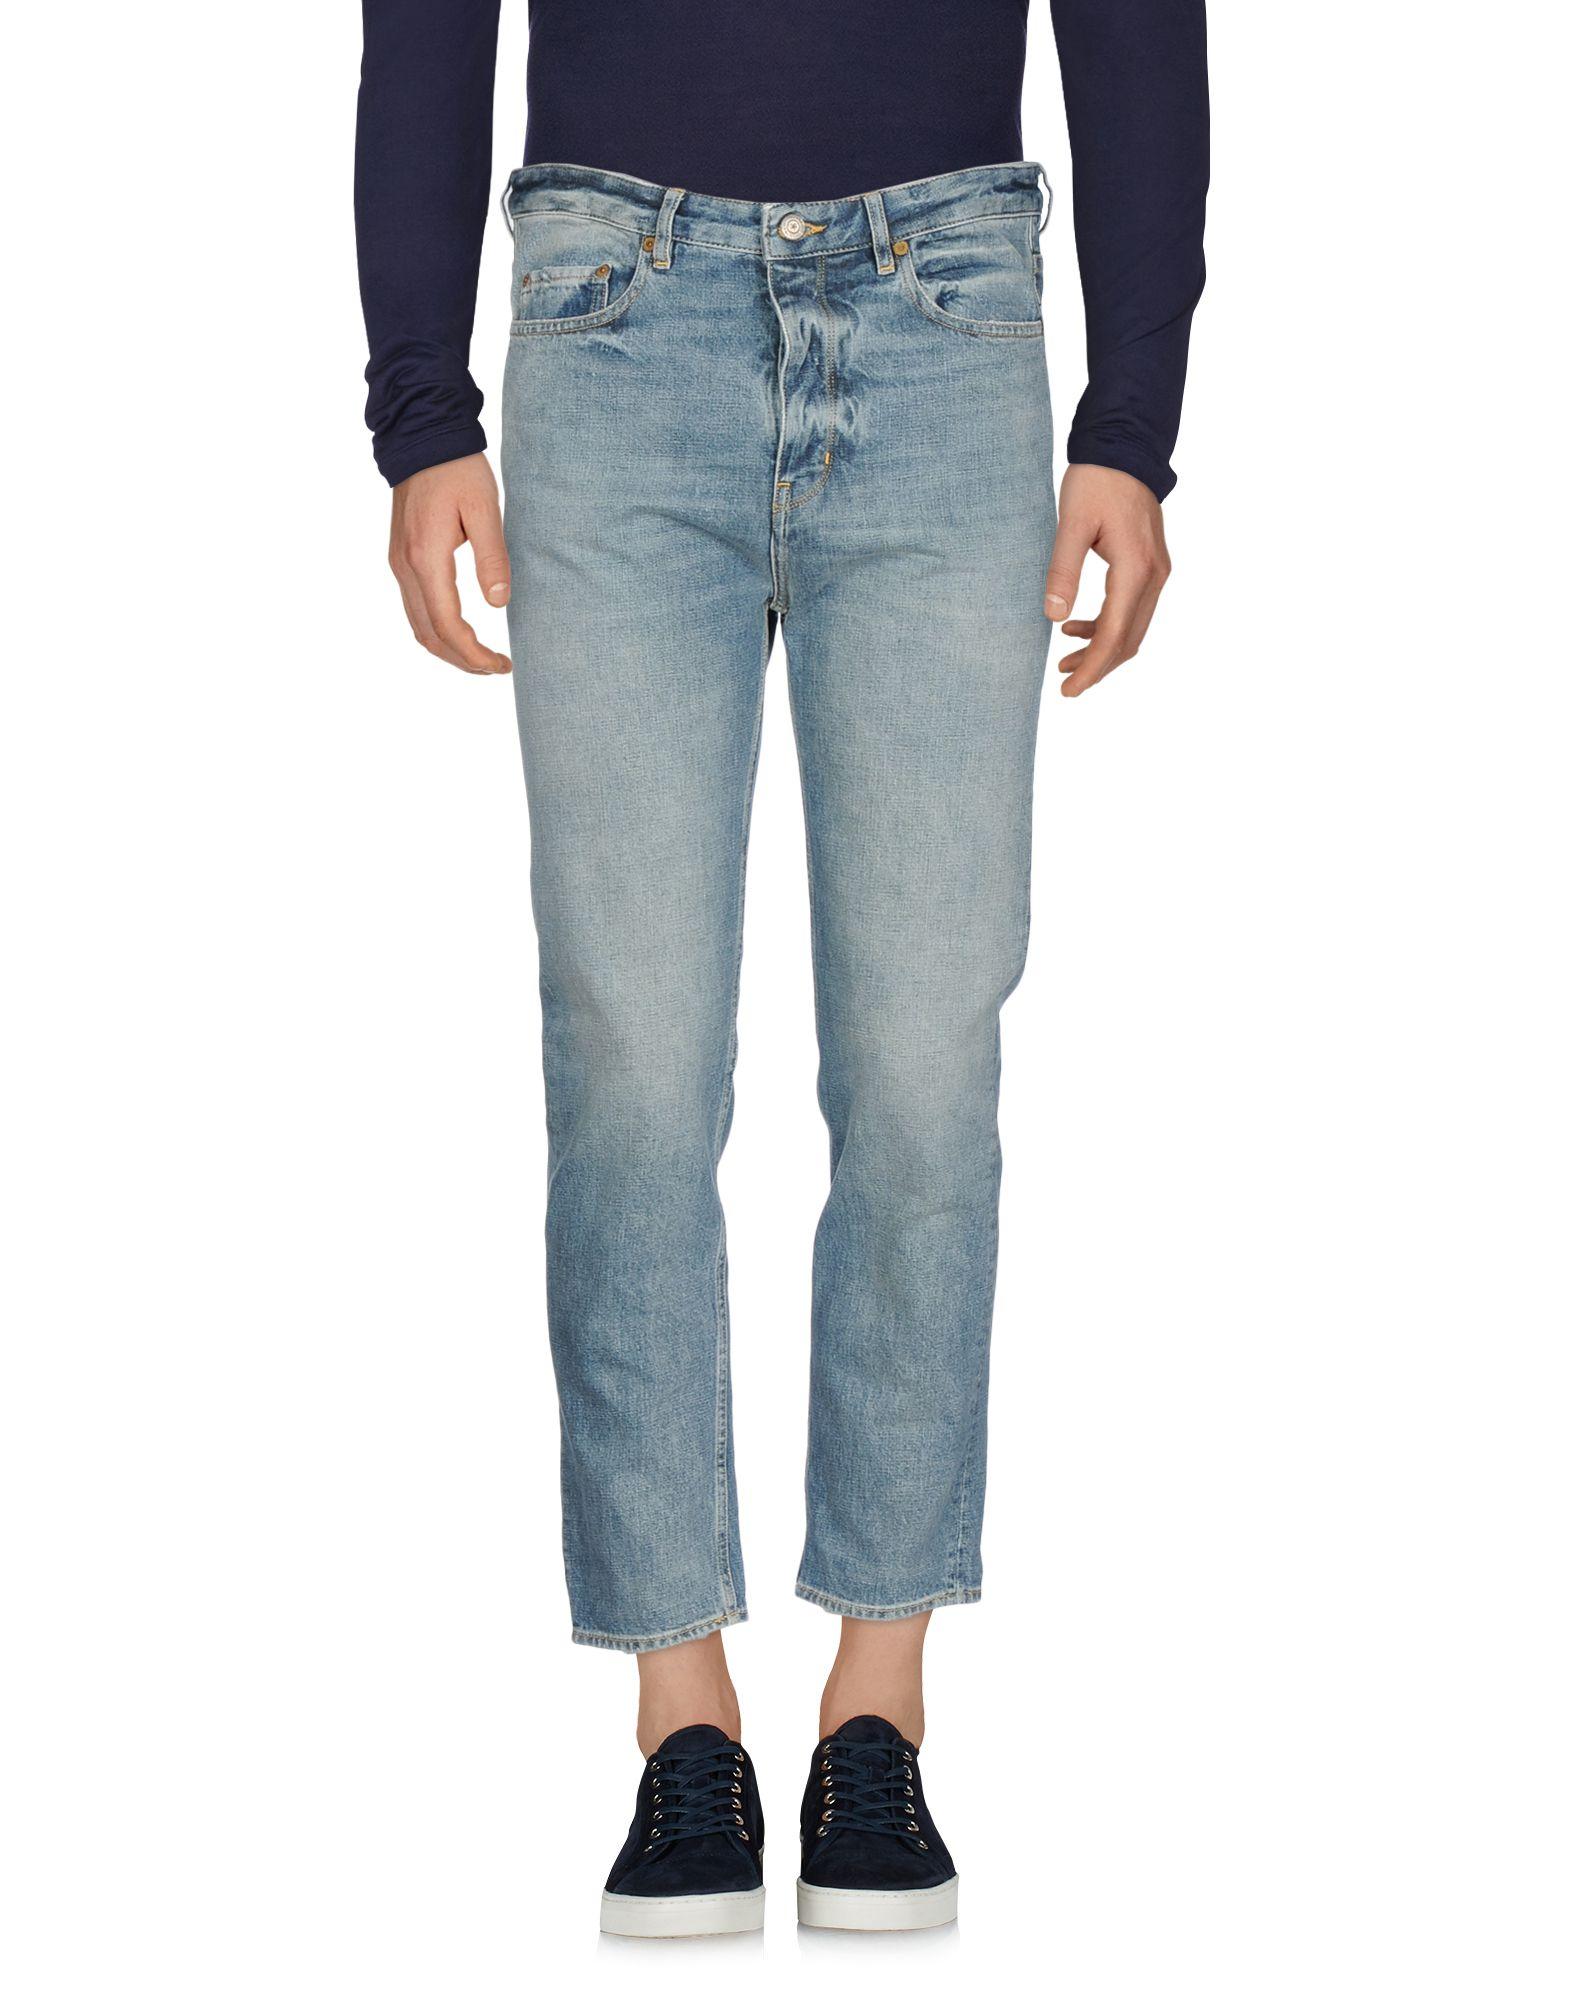 Pantaloni Deluxe Jeans oroen Goose Deluxe Pantaloni Brand Uomo - 42665640DO f49e70